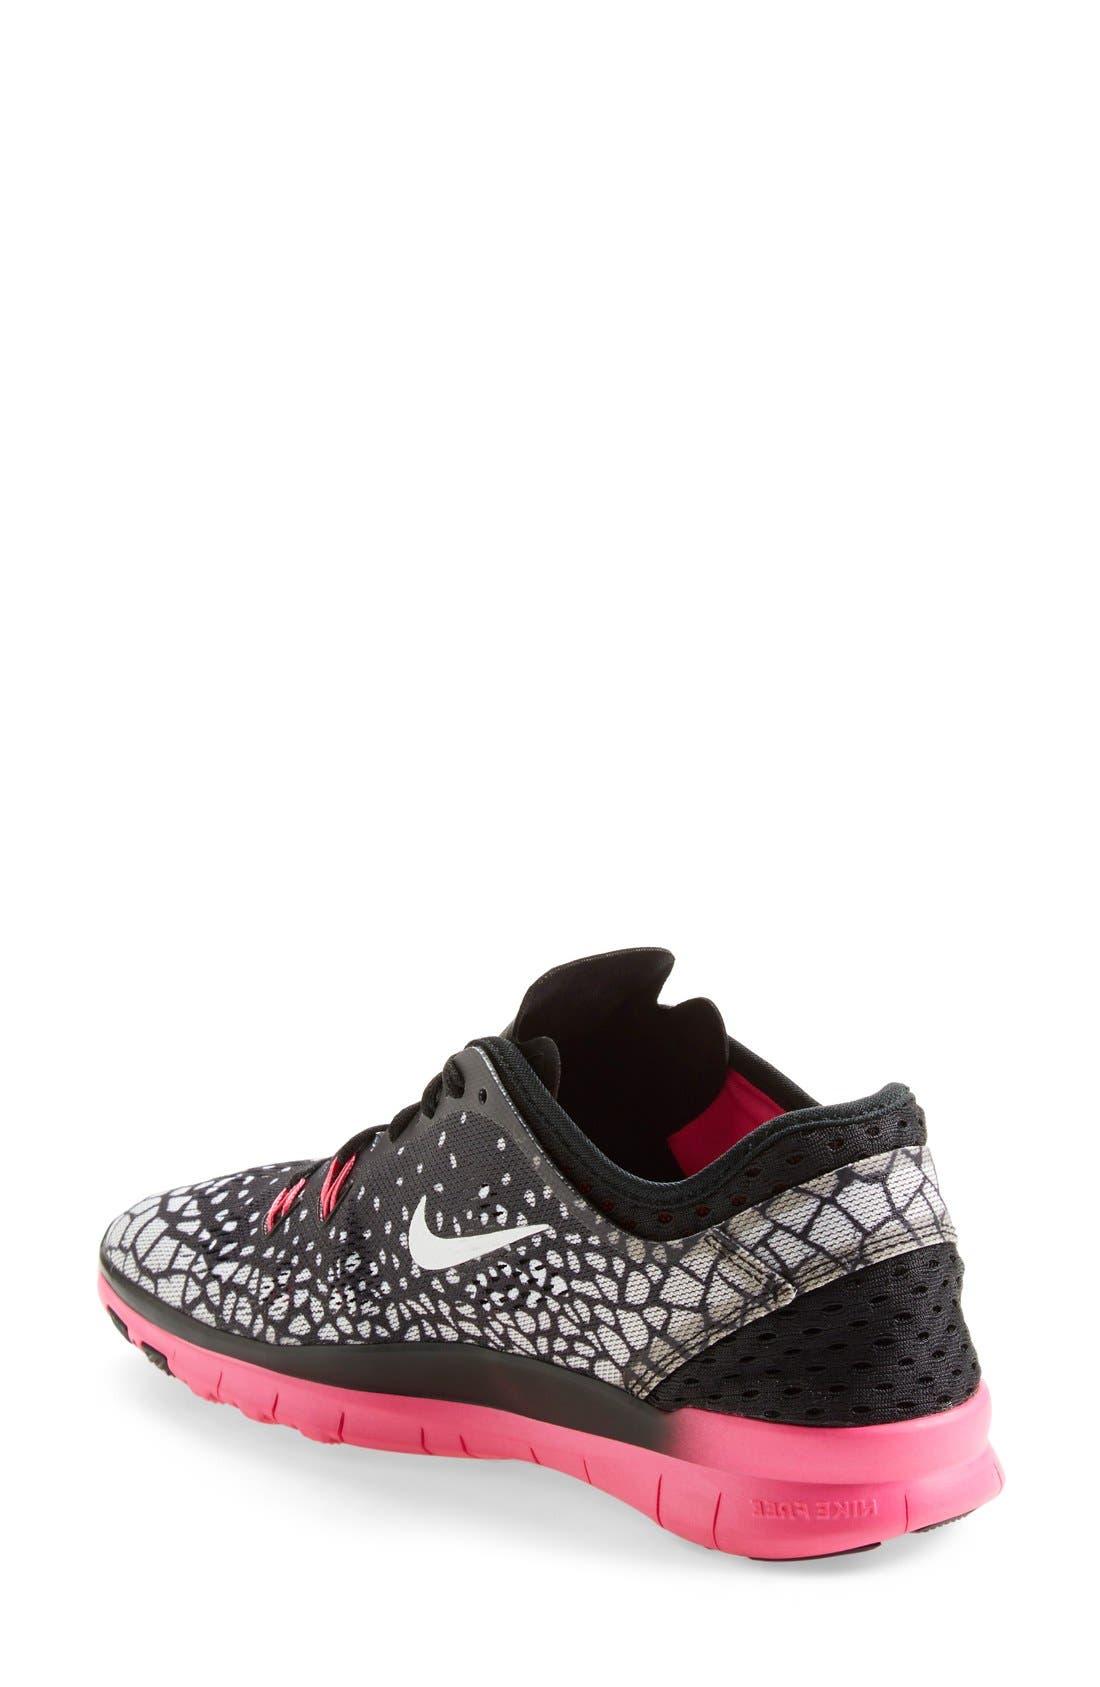 Alternate Image 2  - Nike 'Free 5.0 TR Fit 5 Print' Training Shoe (Women)